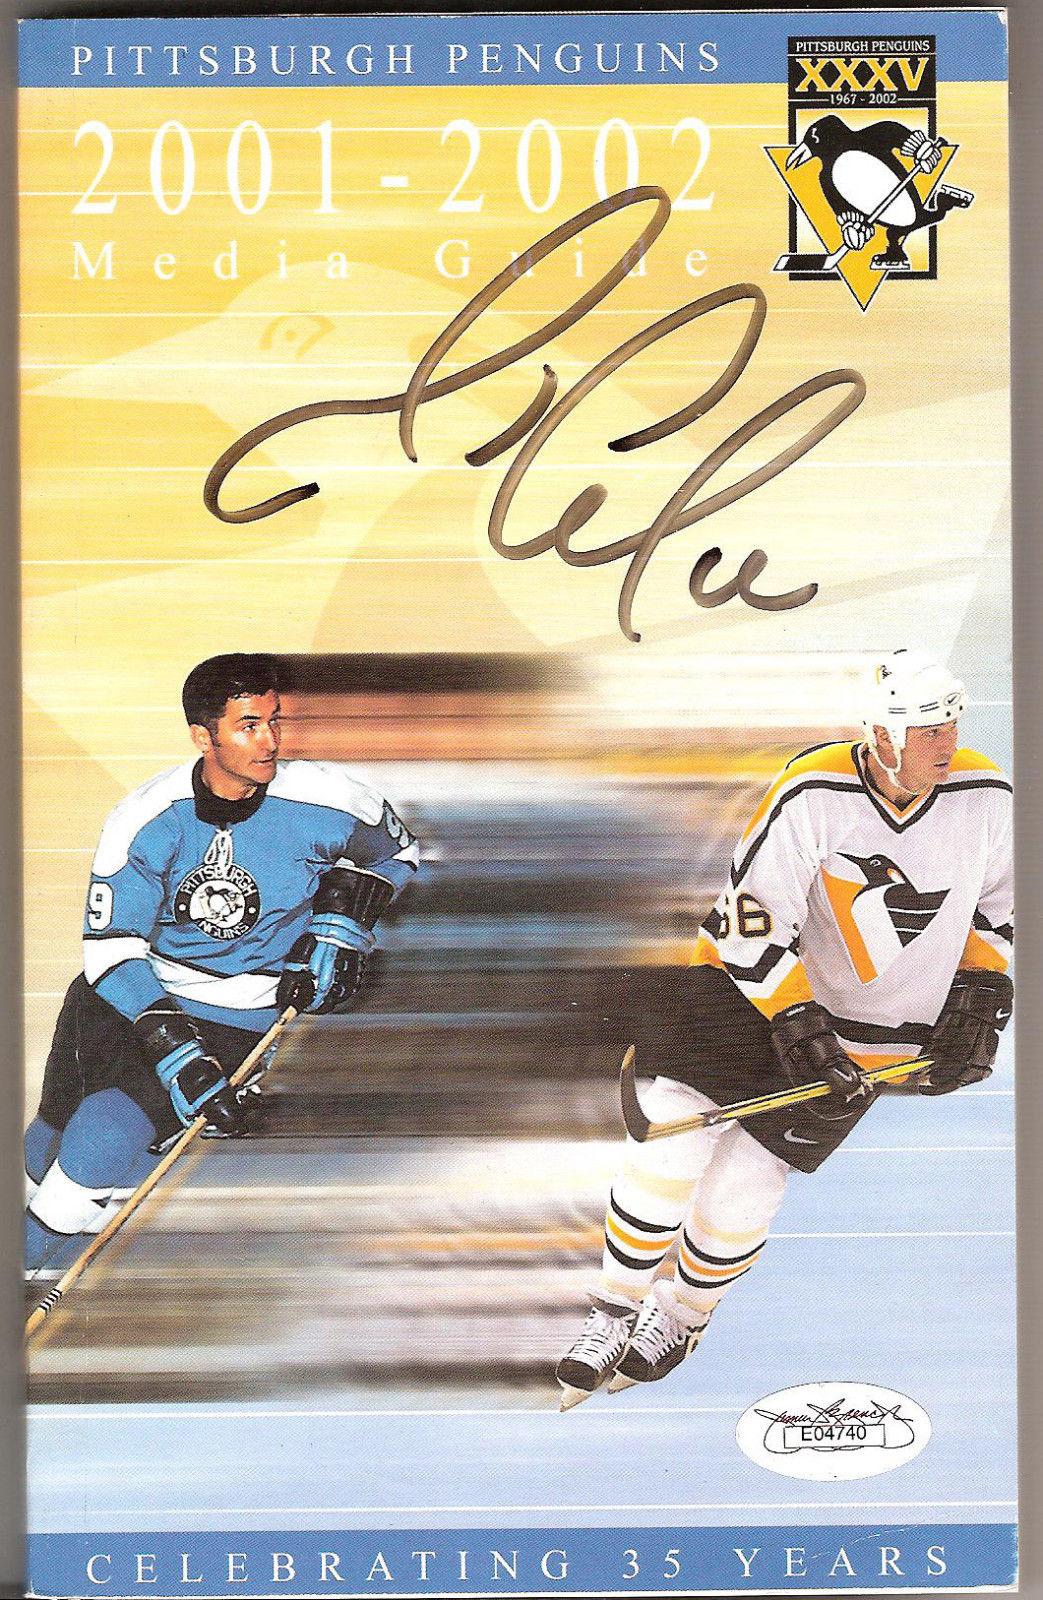 Mario Lemieux Signed Auto 2001-02 Pittsburgh Penguins Media Guide JSA Authentic